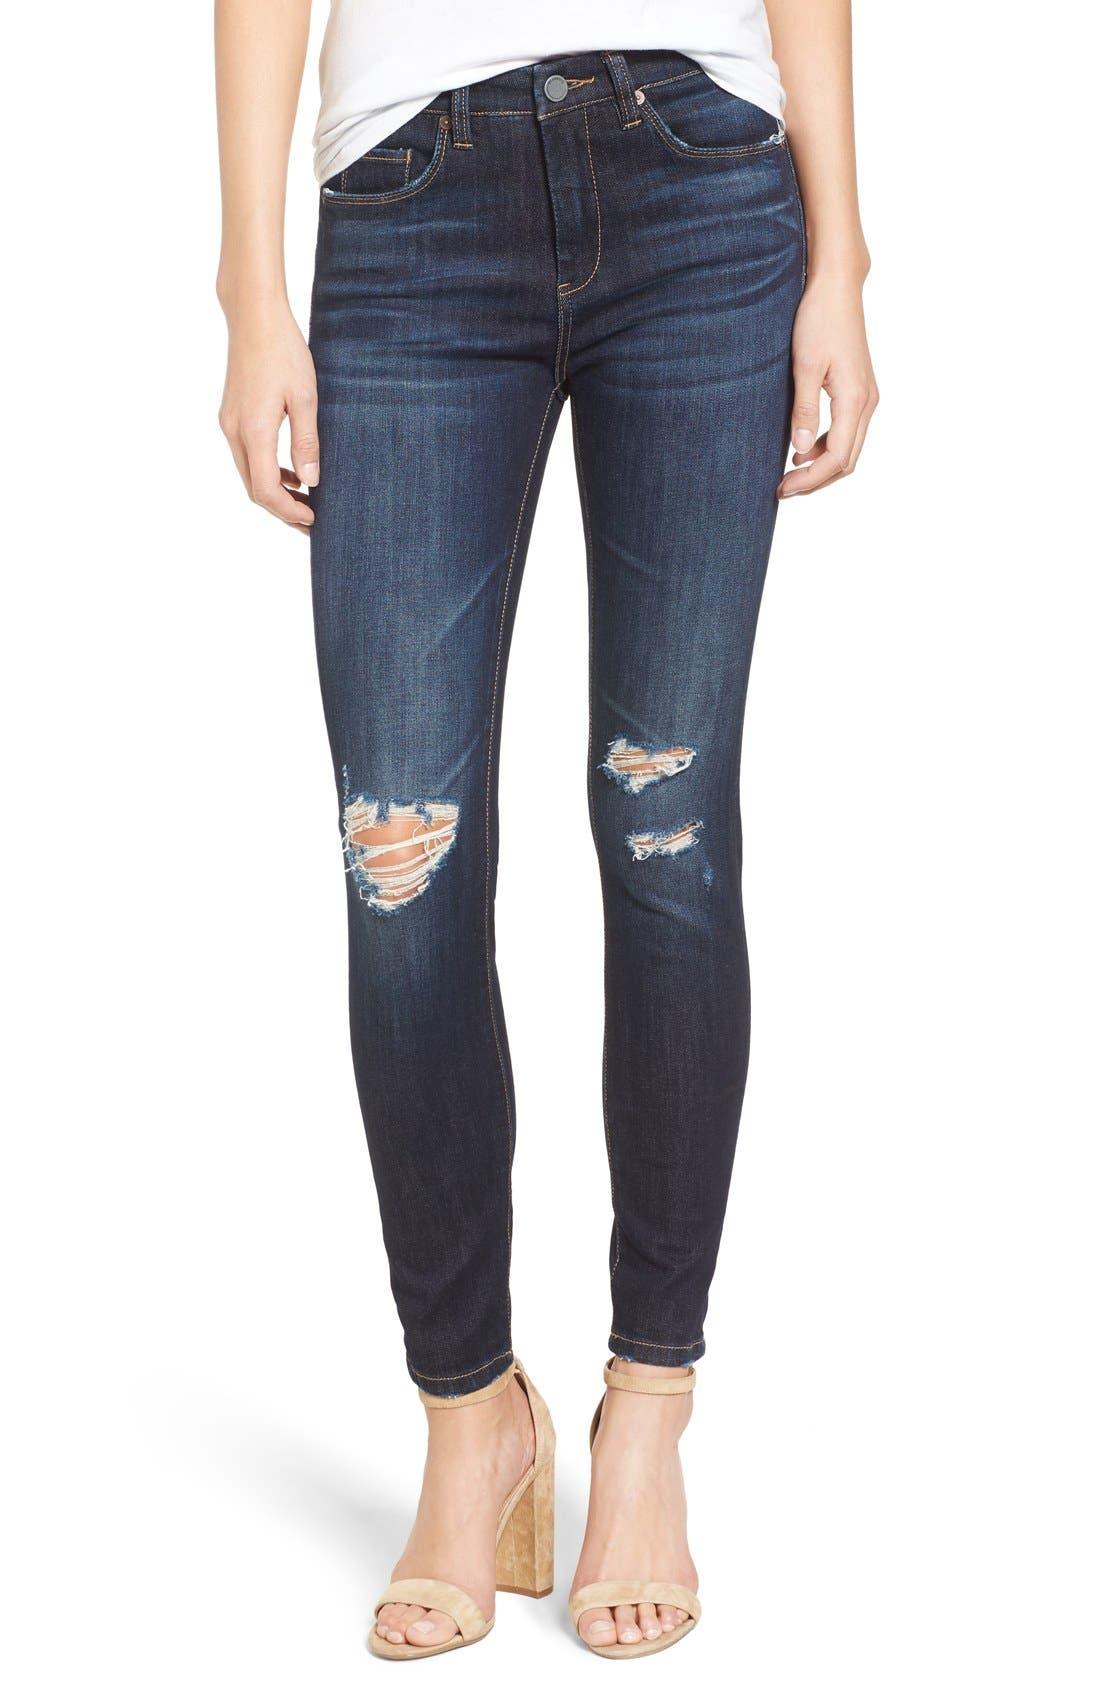 Alternate Image 1 Selected - BLANKNYC Distressed Skinny Jeans (Fully Loaded)